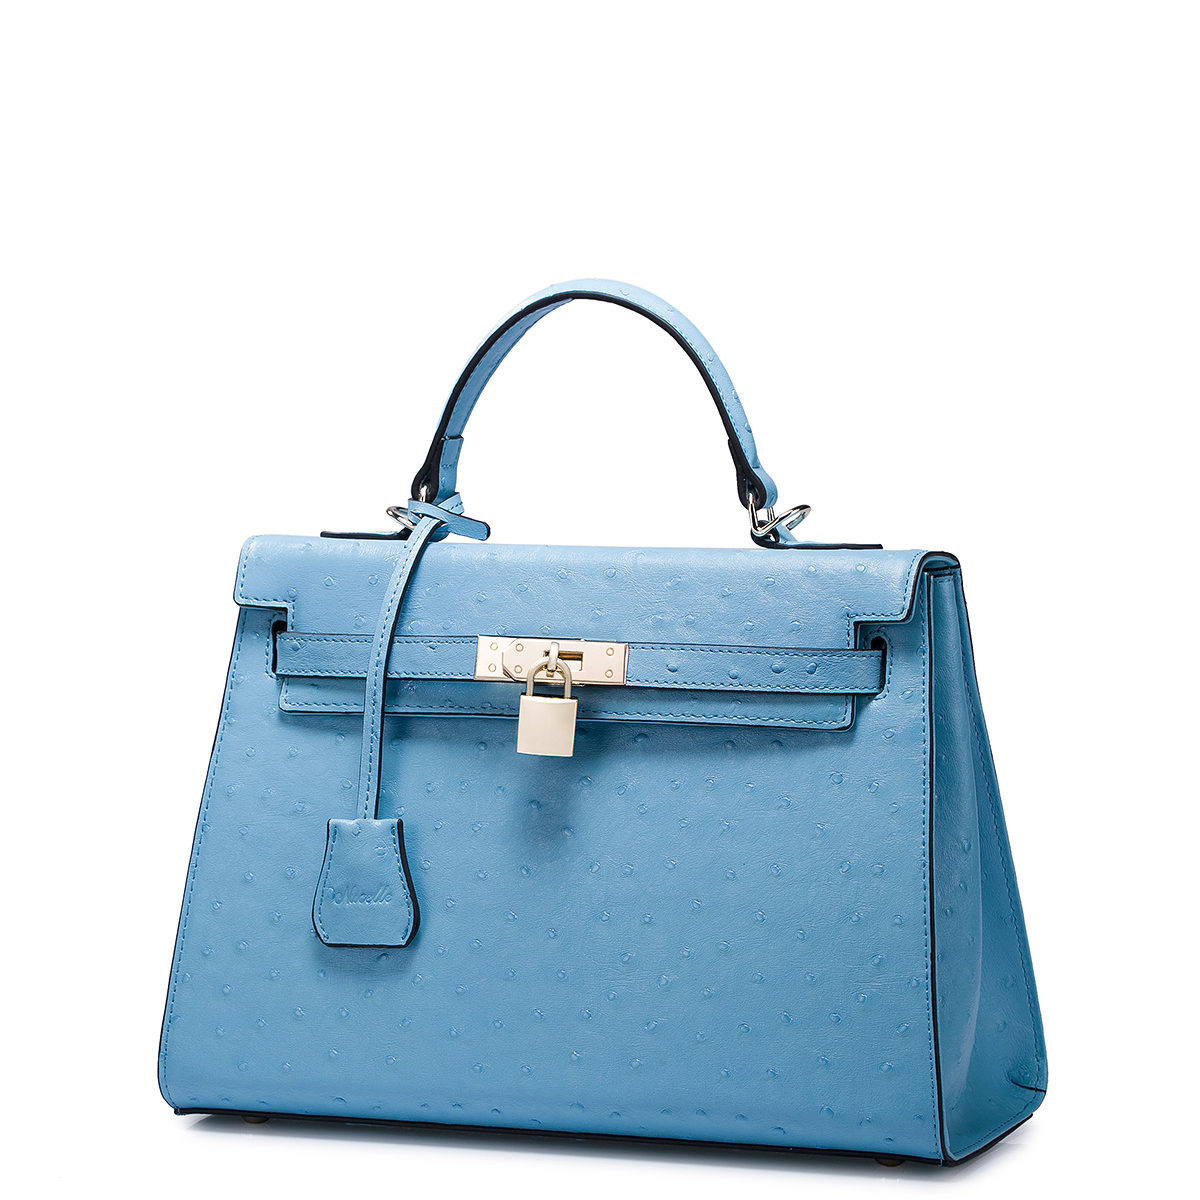 "8f16e9fb411d Bald nach dem Life Magazine-Schnappschuss wurde die ""petit sac haut à  courroies"" in den Medien als ""Kelly Bag"" tituliert. Offiziell nannte Hermès  die Tasche ..."